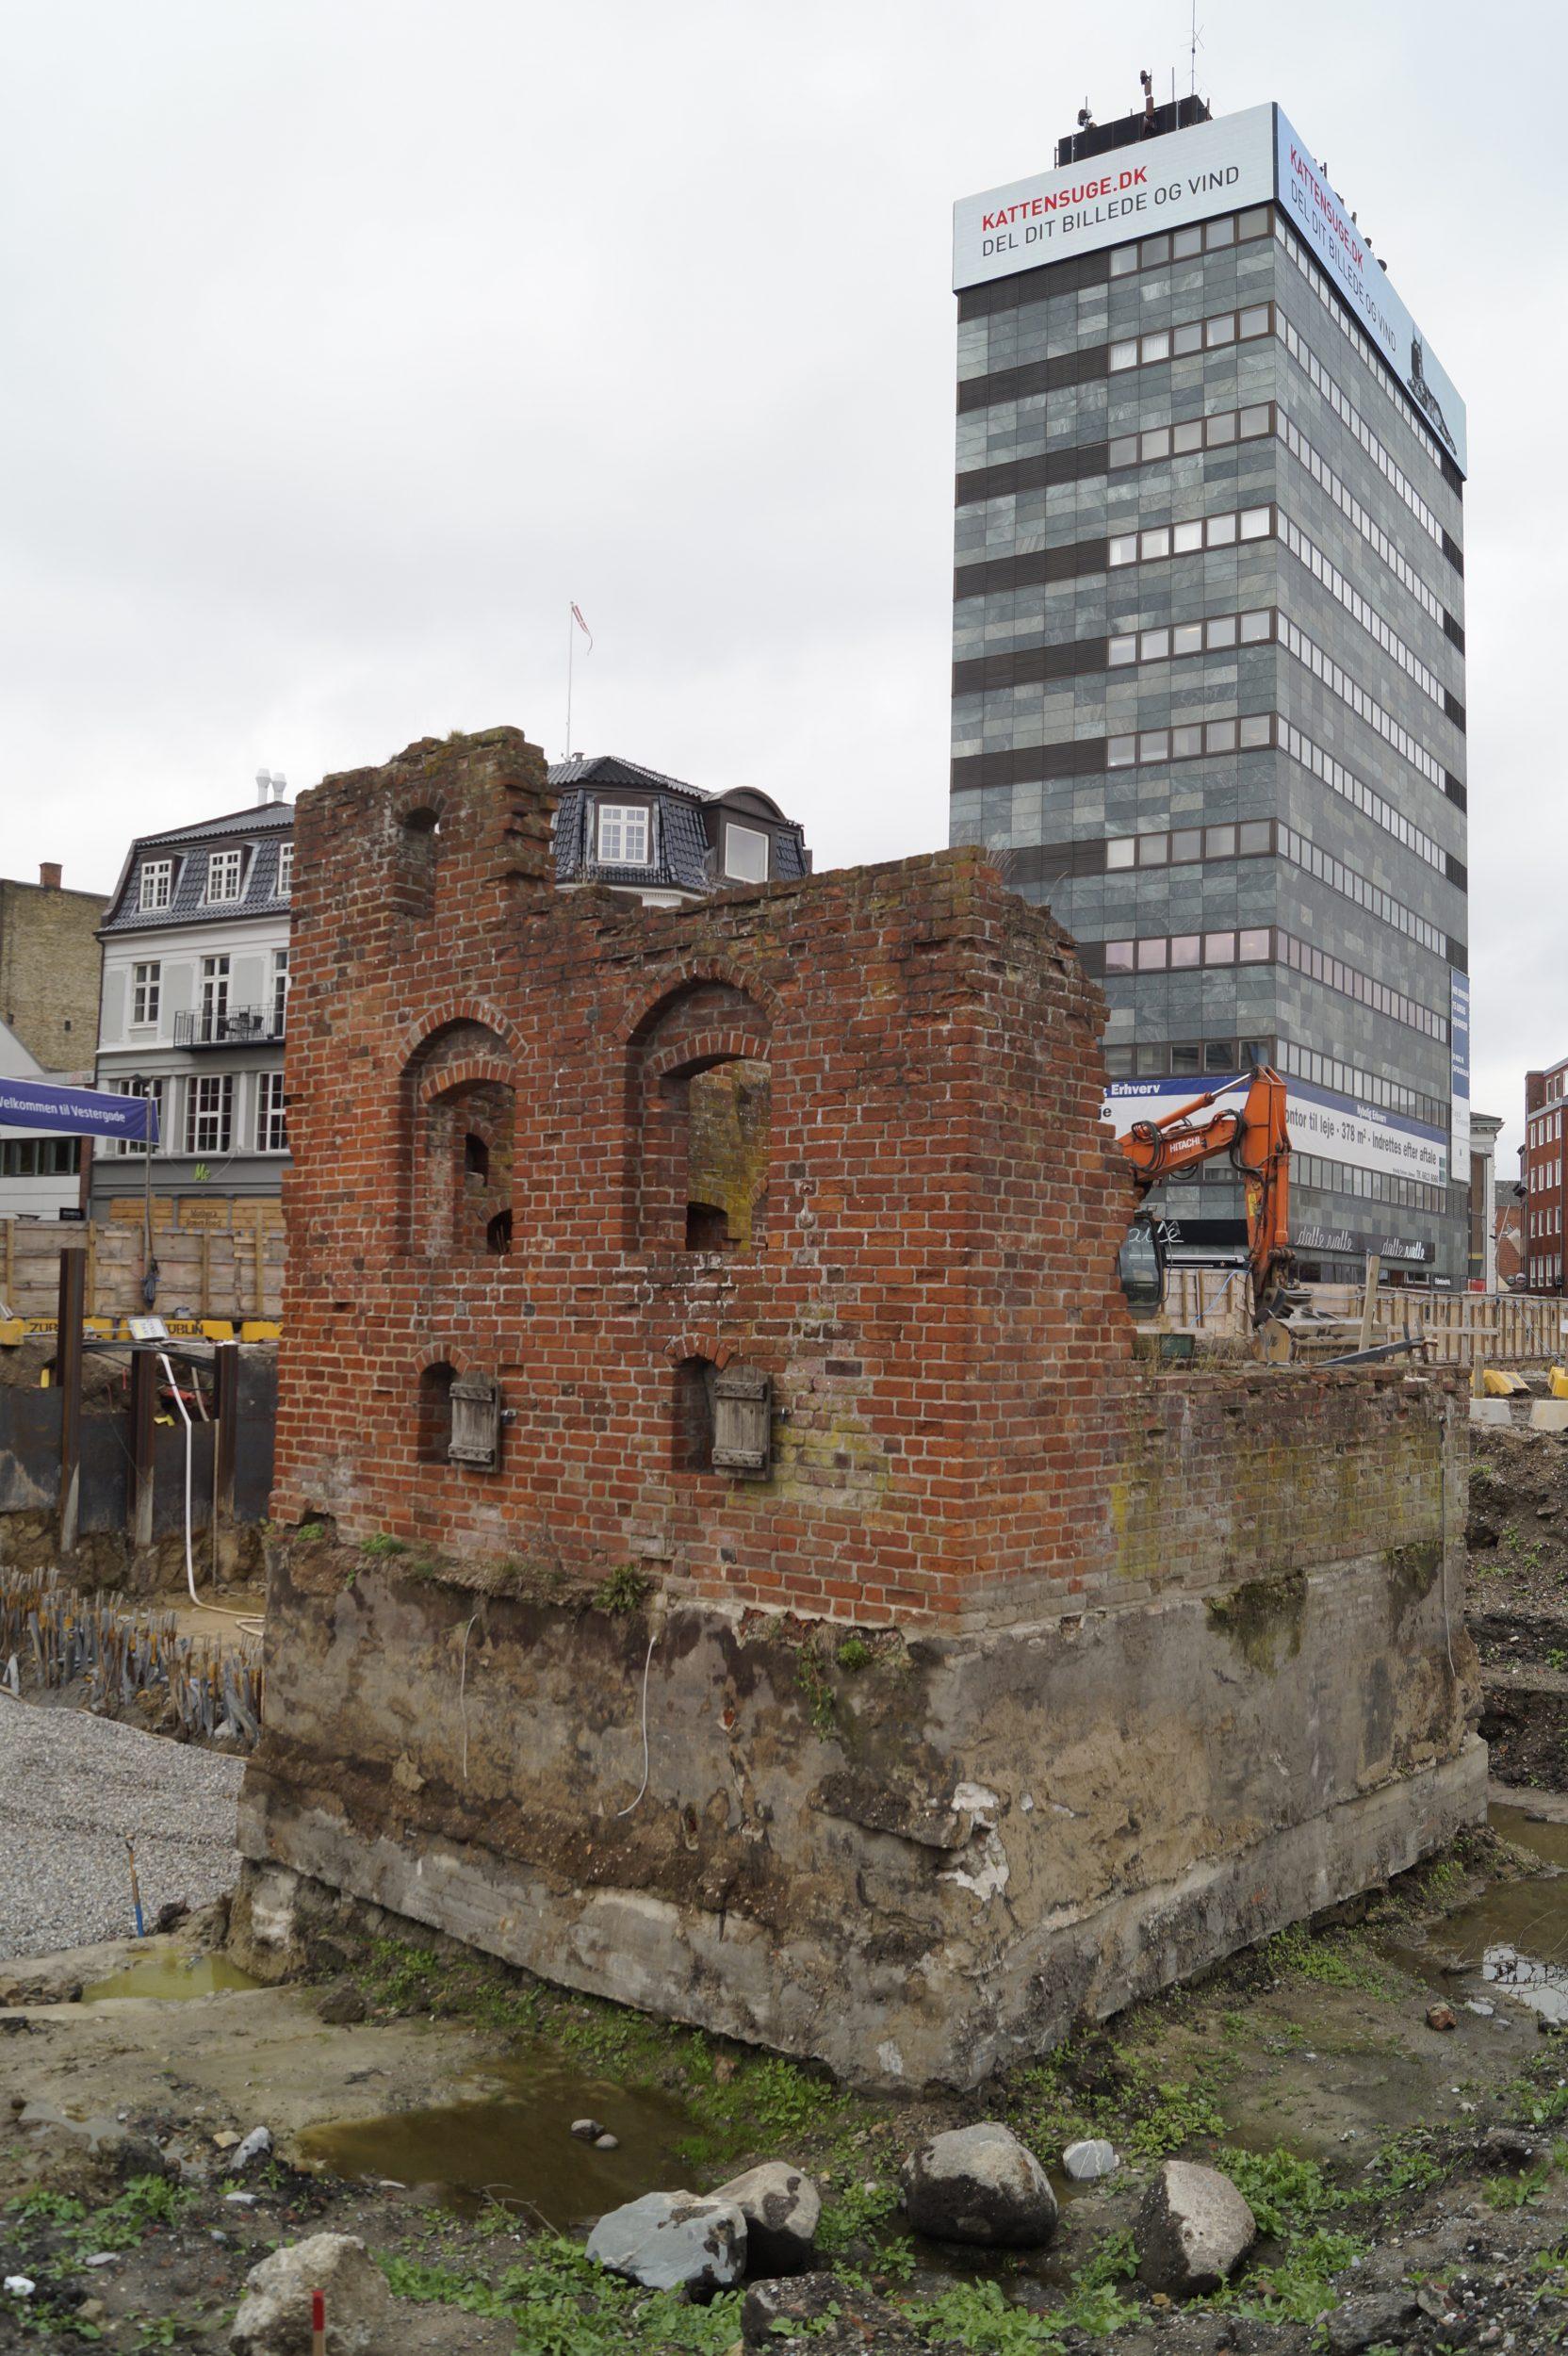 odense gamle by sluts billeder